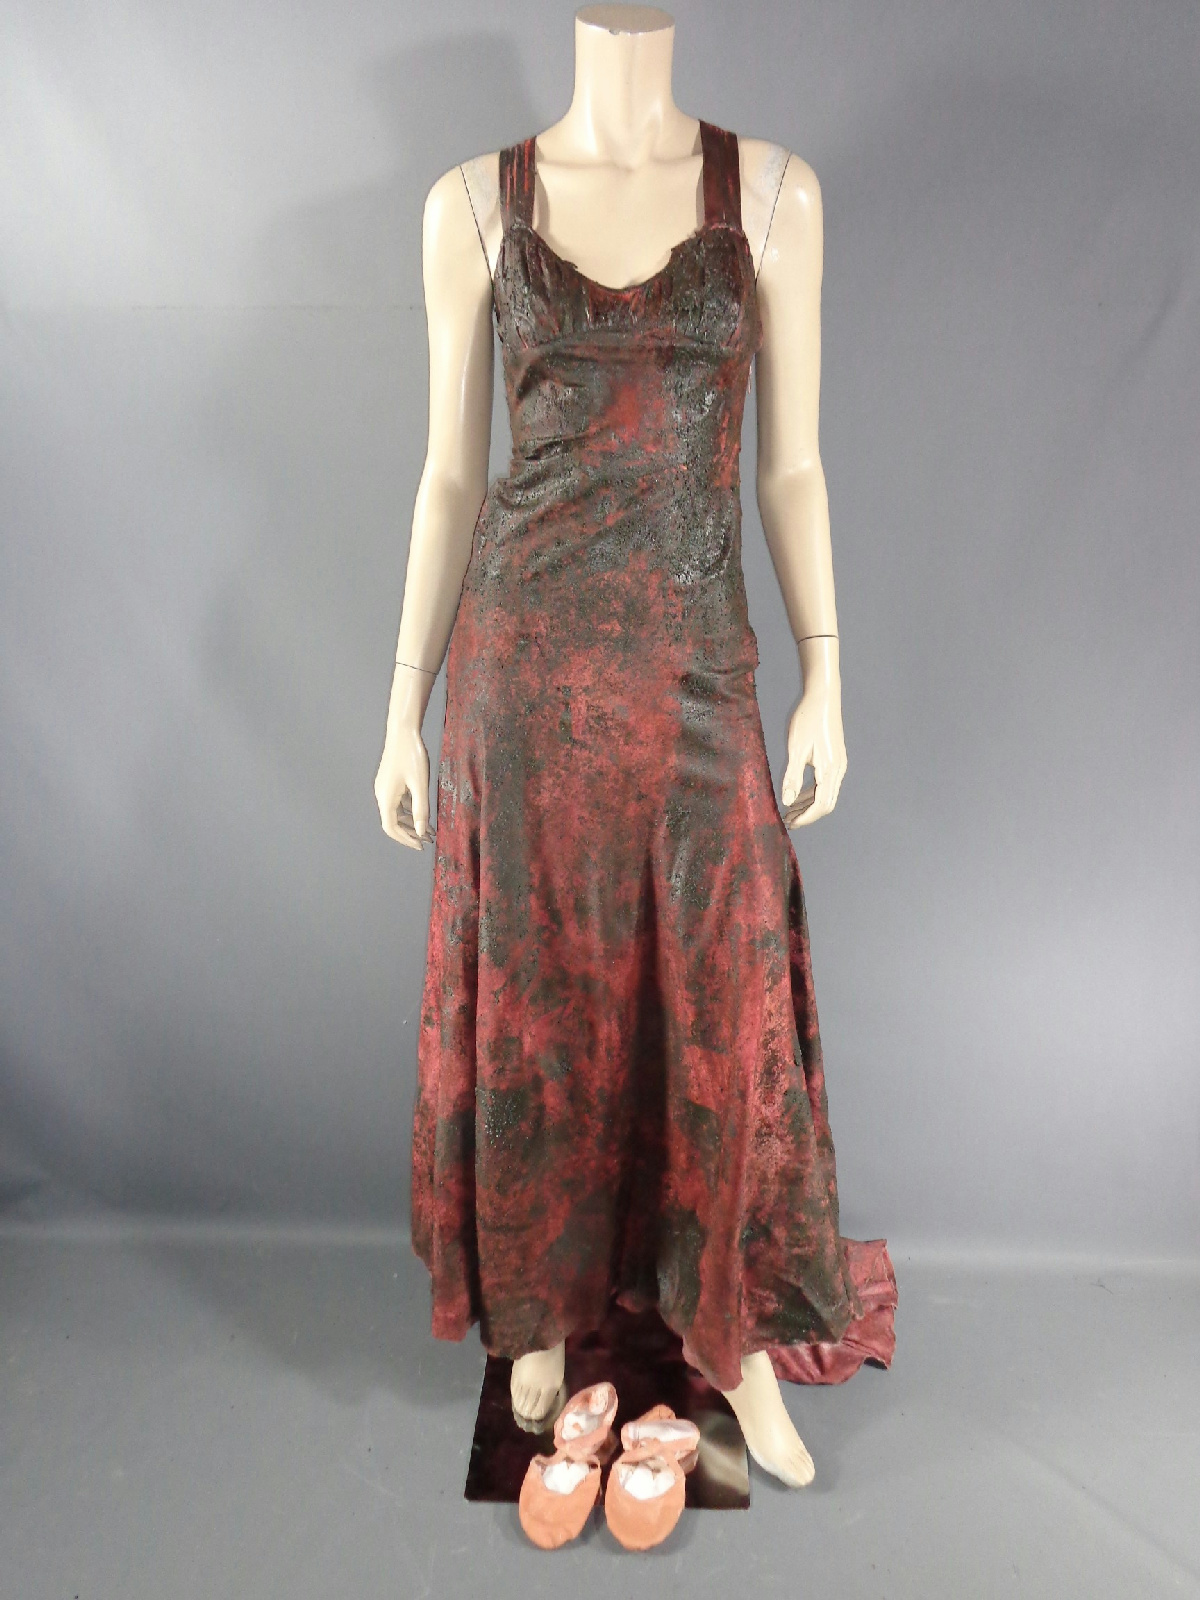 Carrie Carrie White Chloe Grace Moretz Screen Worn Bloody